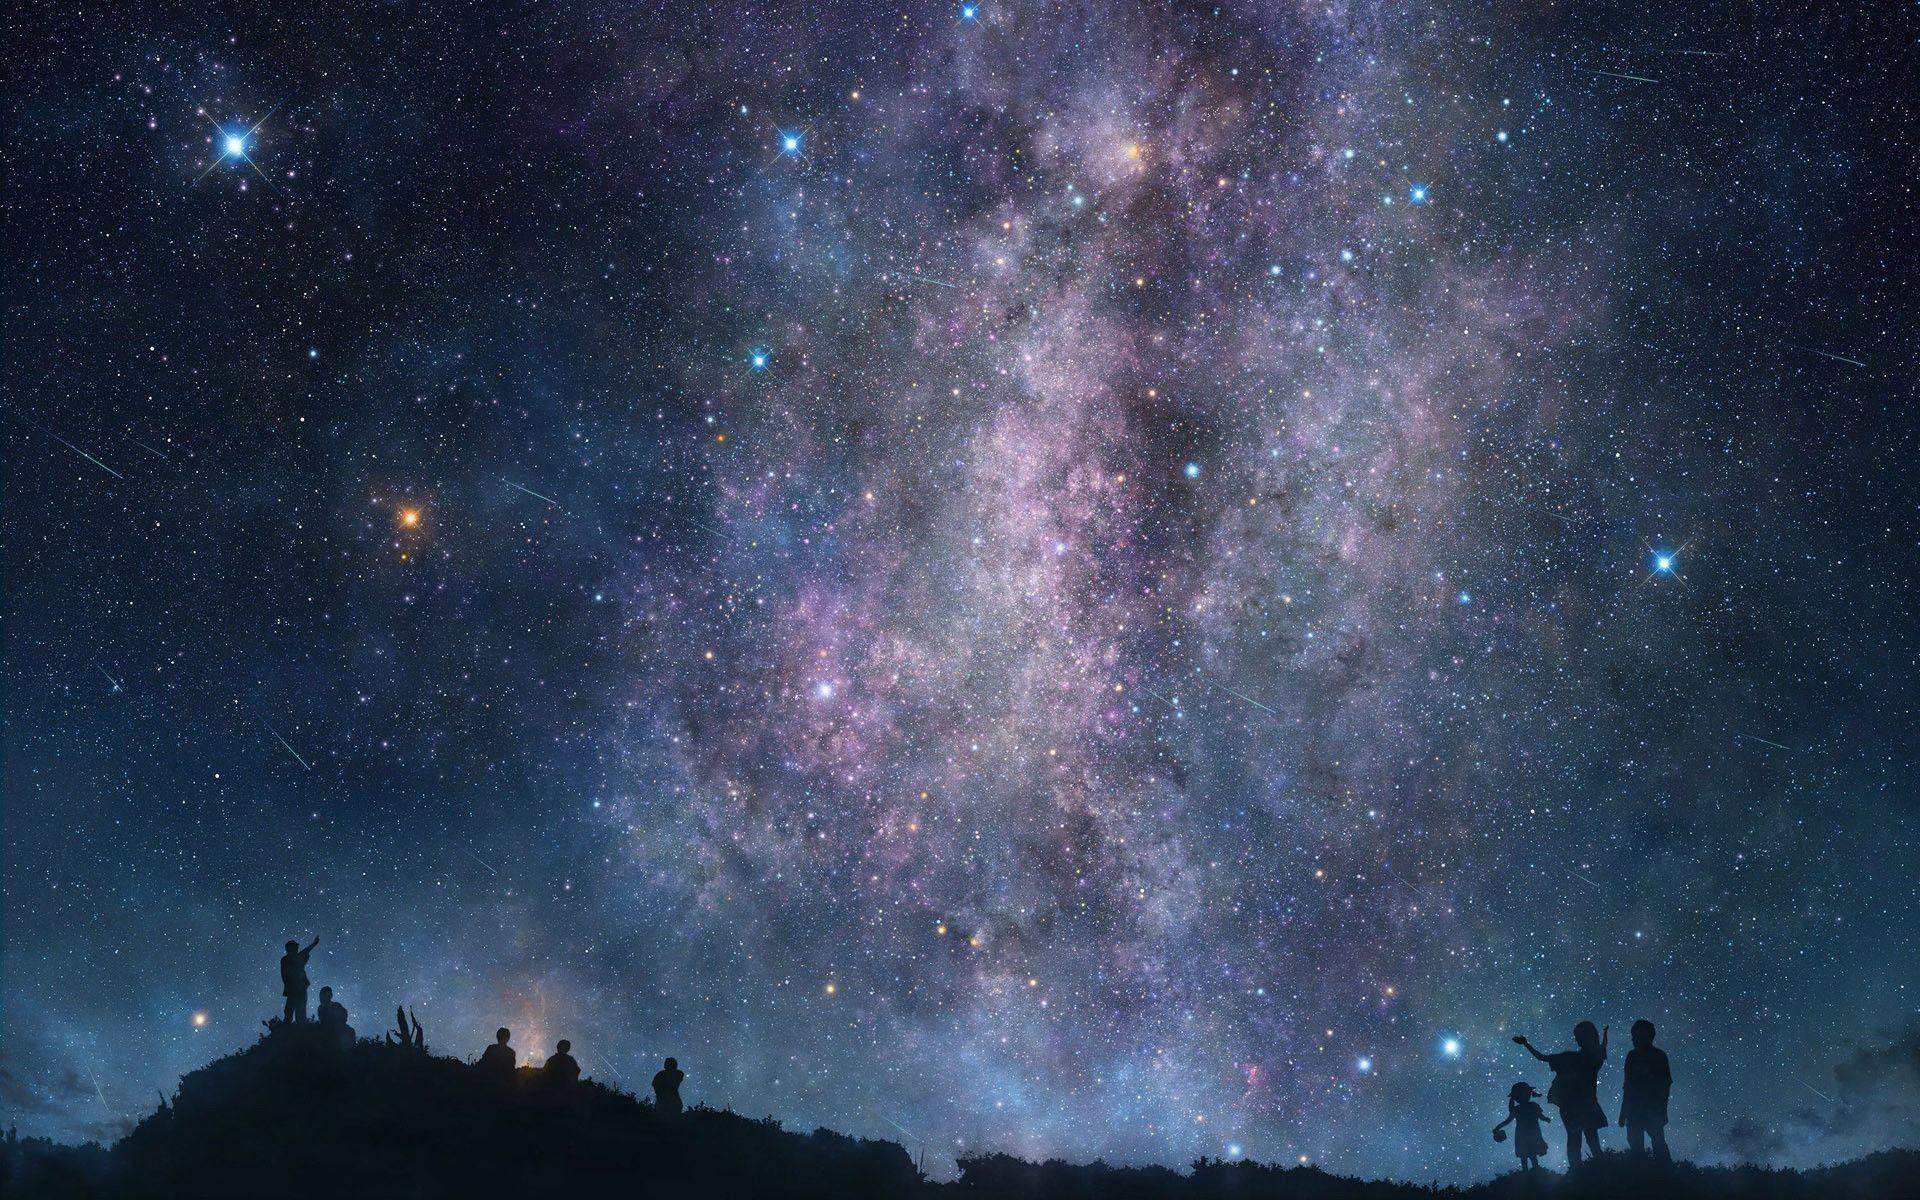 Night Sky Stars Wallpaper Mobile For Desktop px KB